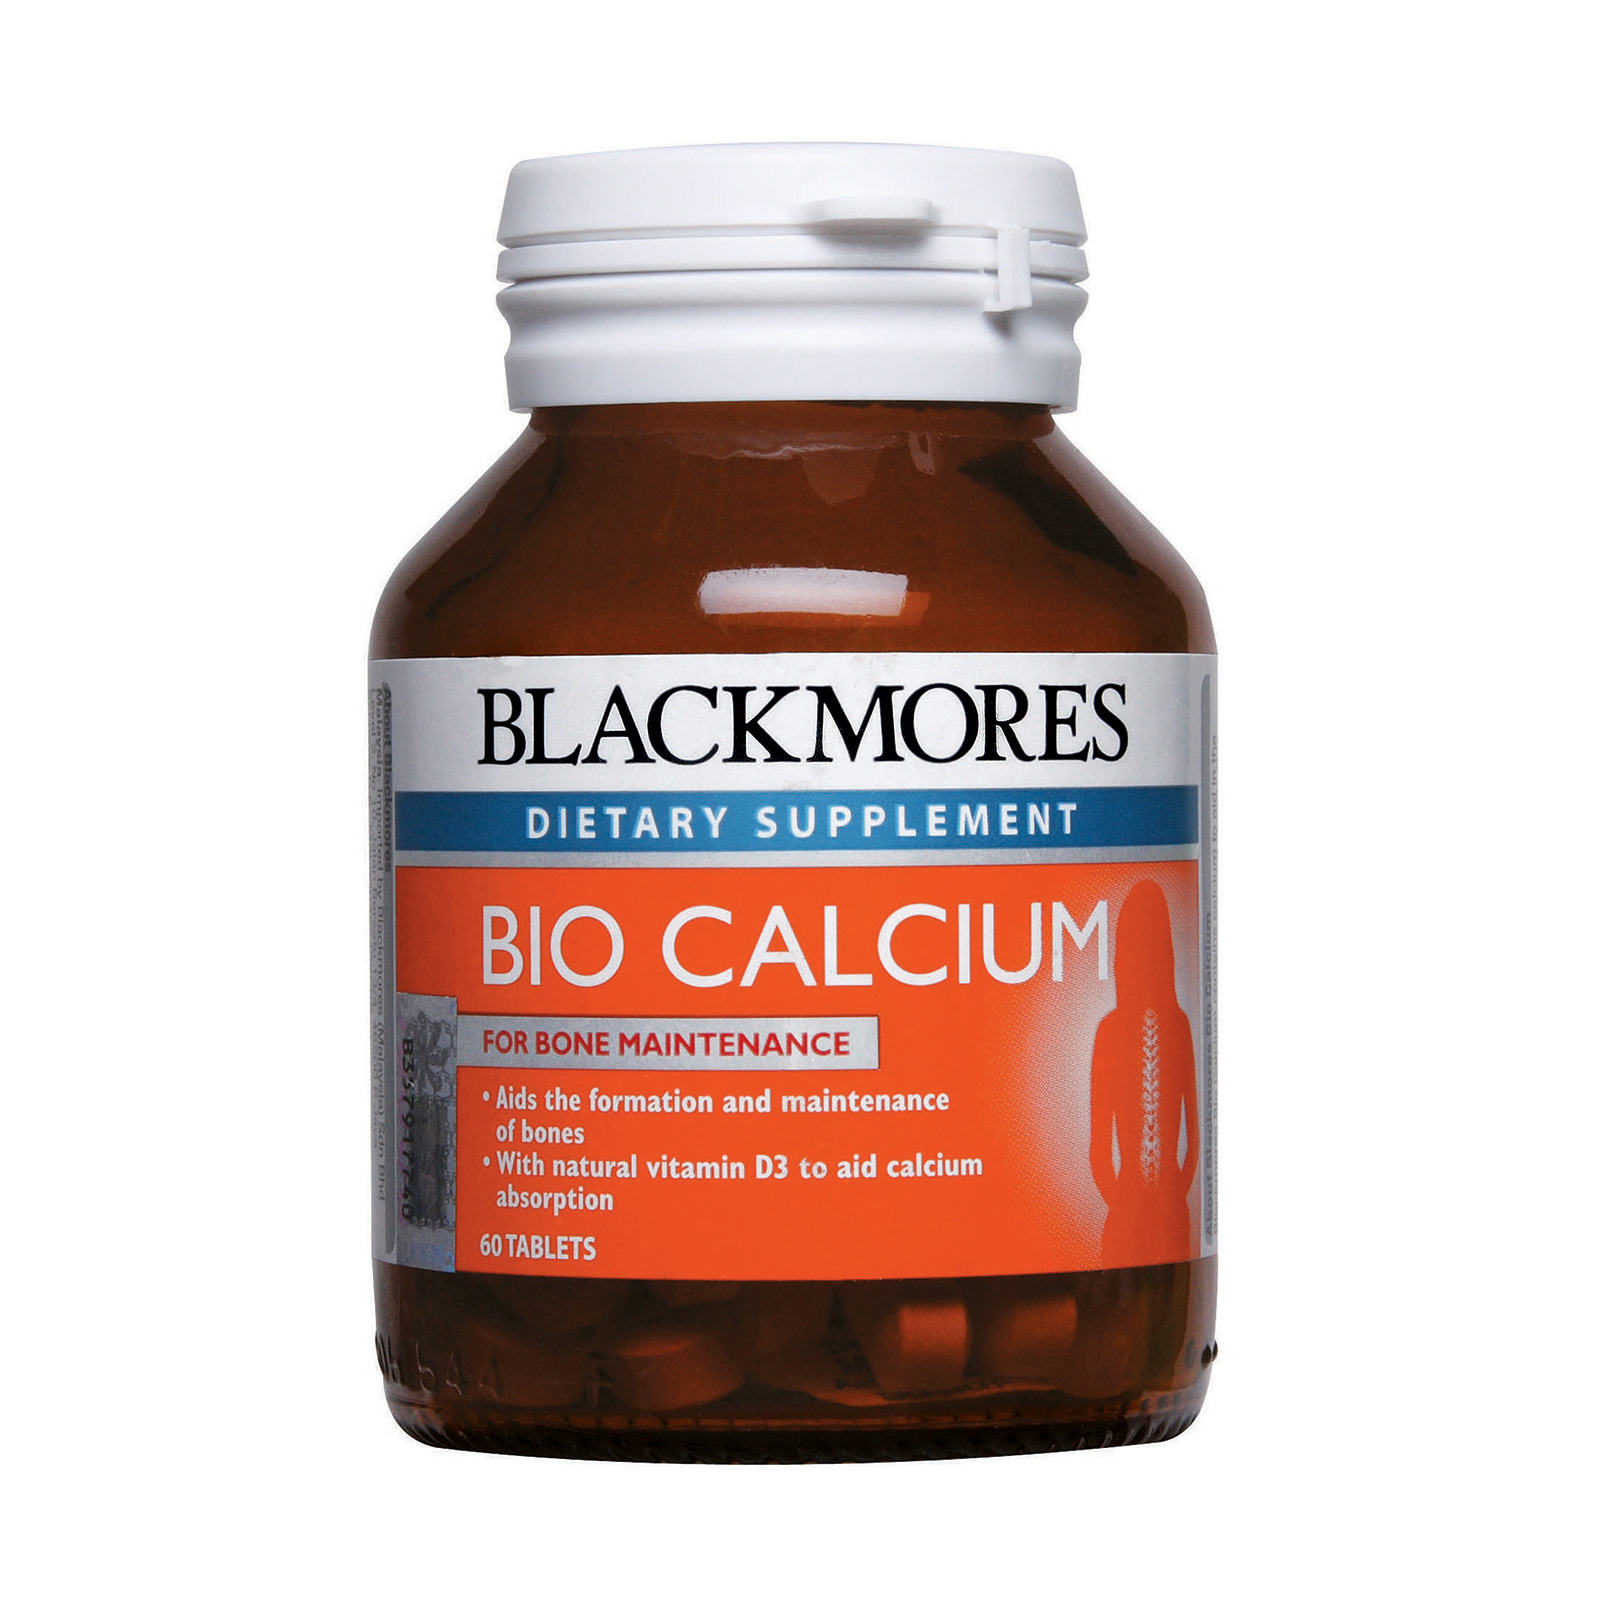 Blackmores Dietary Supplement Bio Calcium (Bone Maintenance) 60tablets,